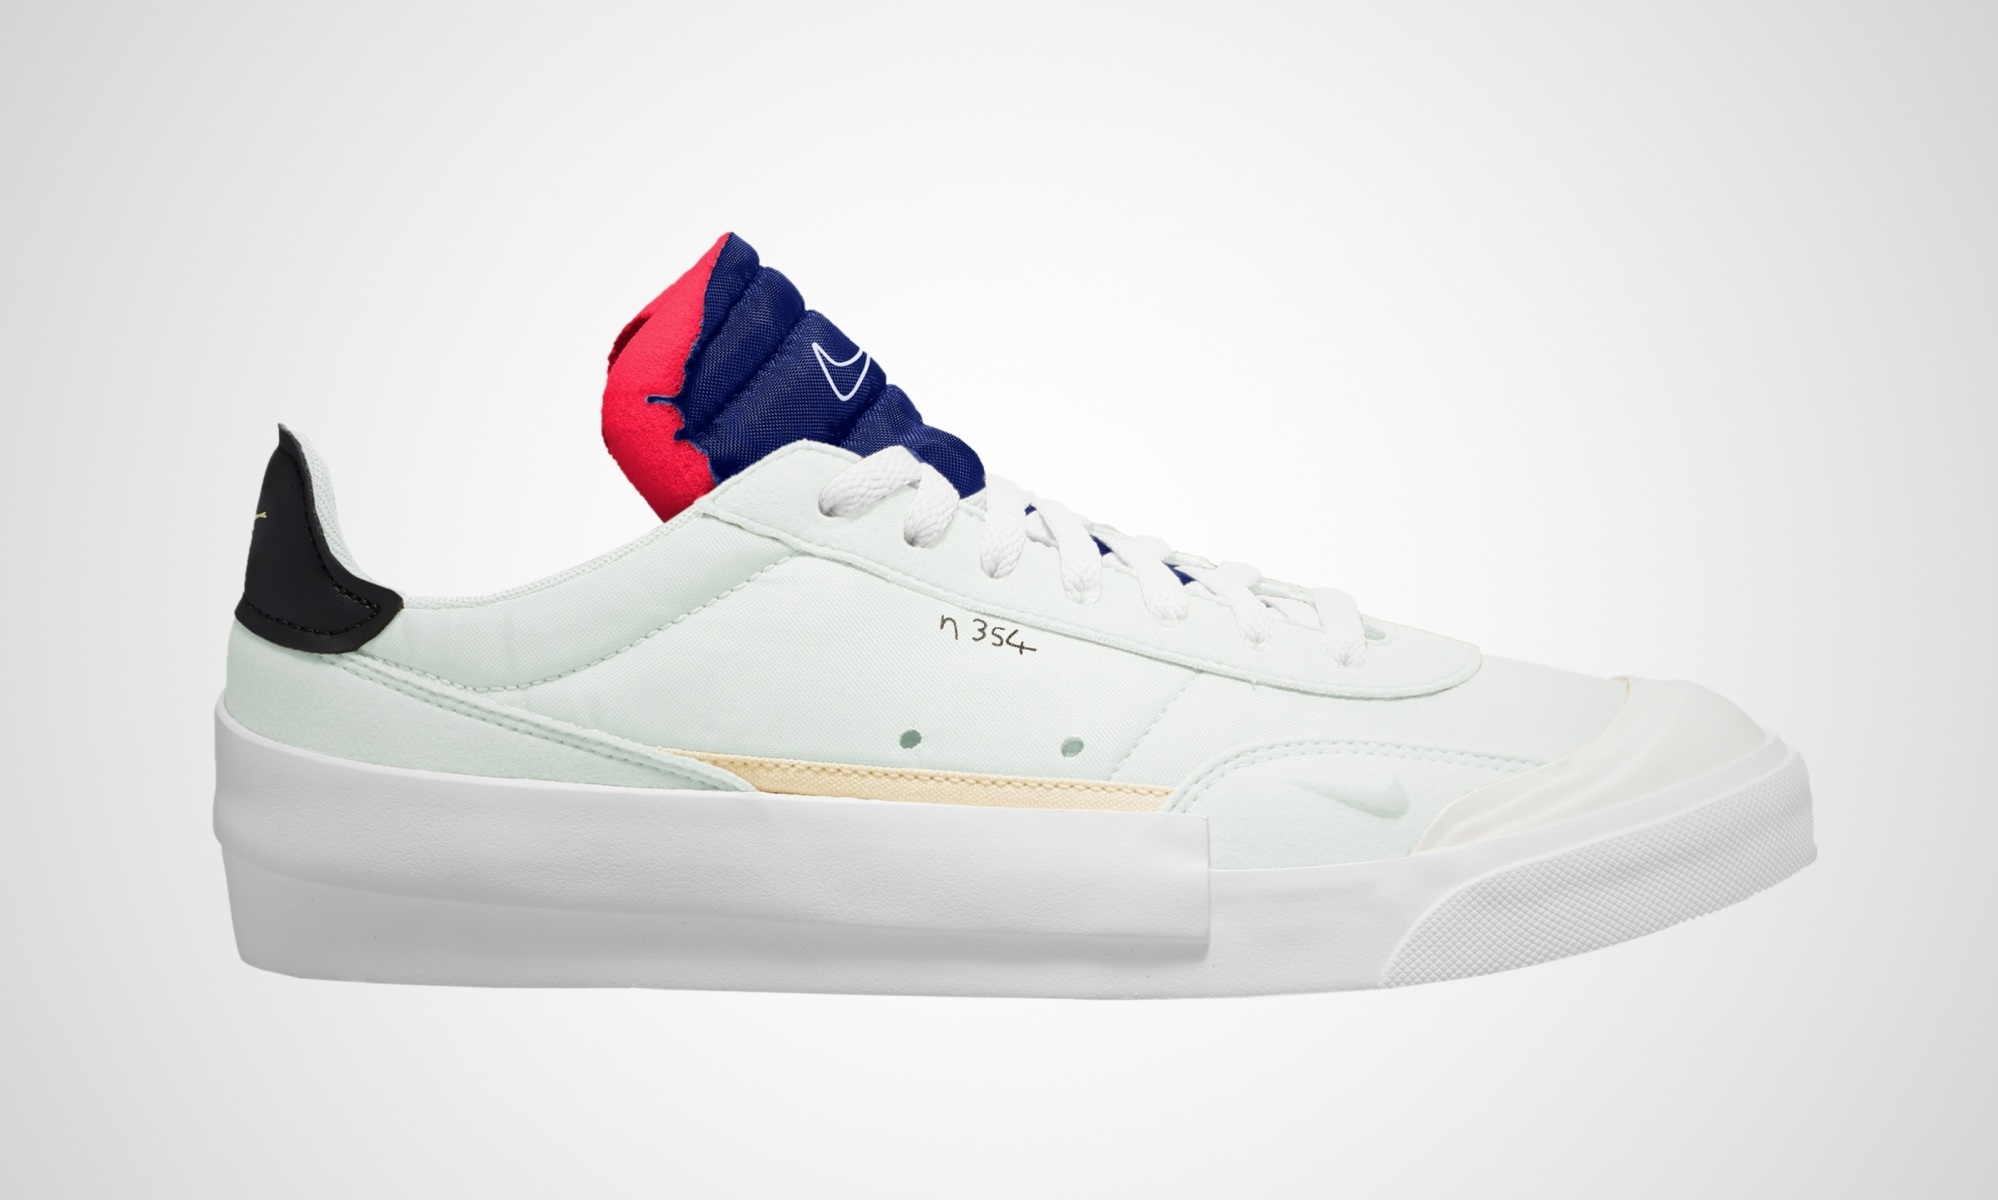 classic fit 33cf8 73269 Sneaker Releases - Dead Stock Sneakerblog